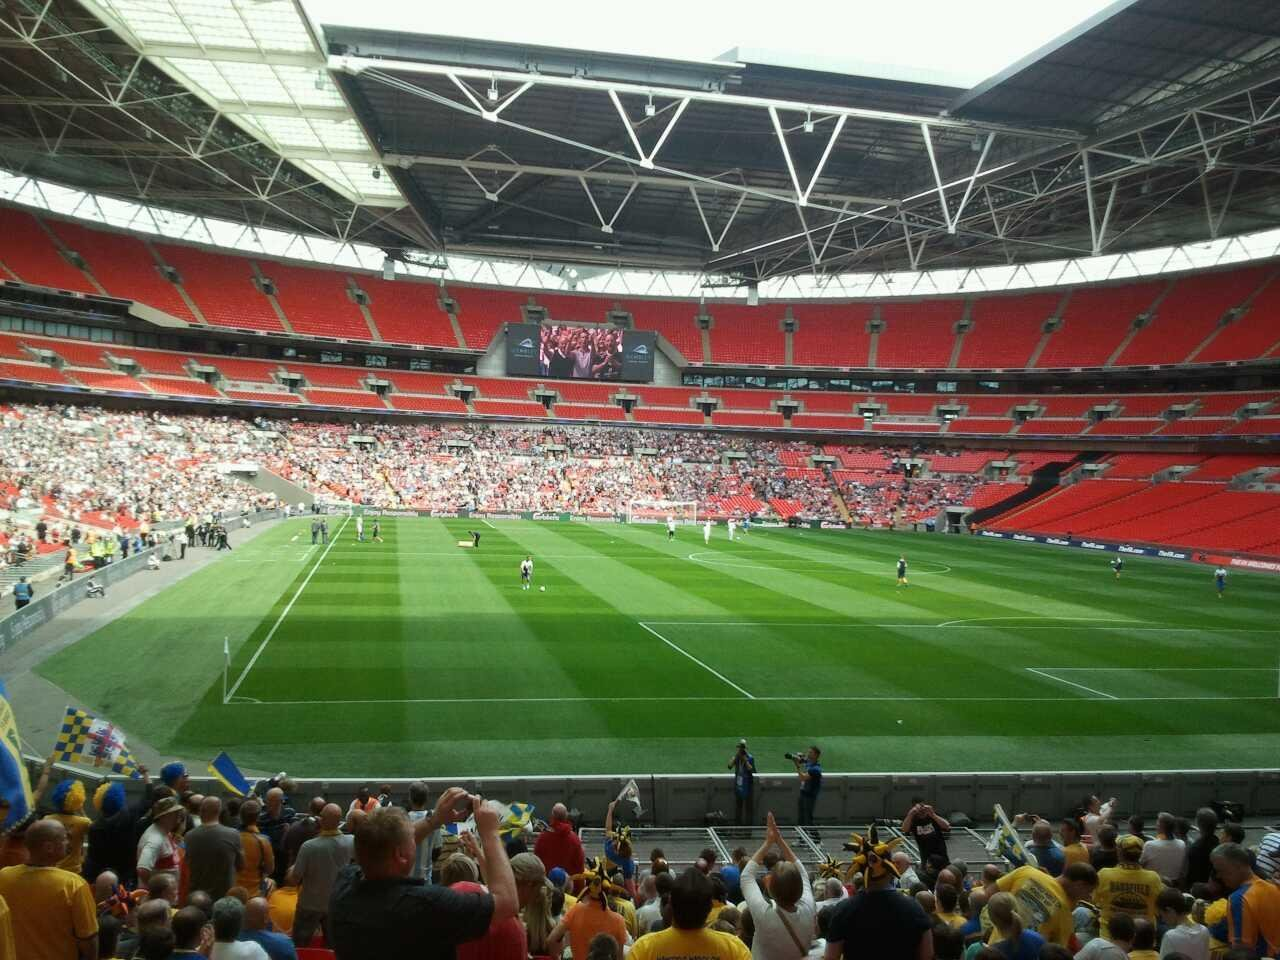 Wembley Stadium Section 136 Row 16